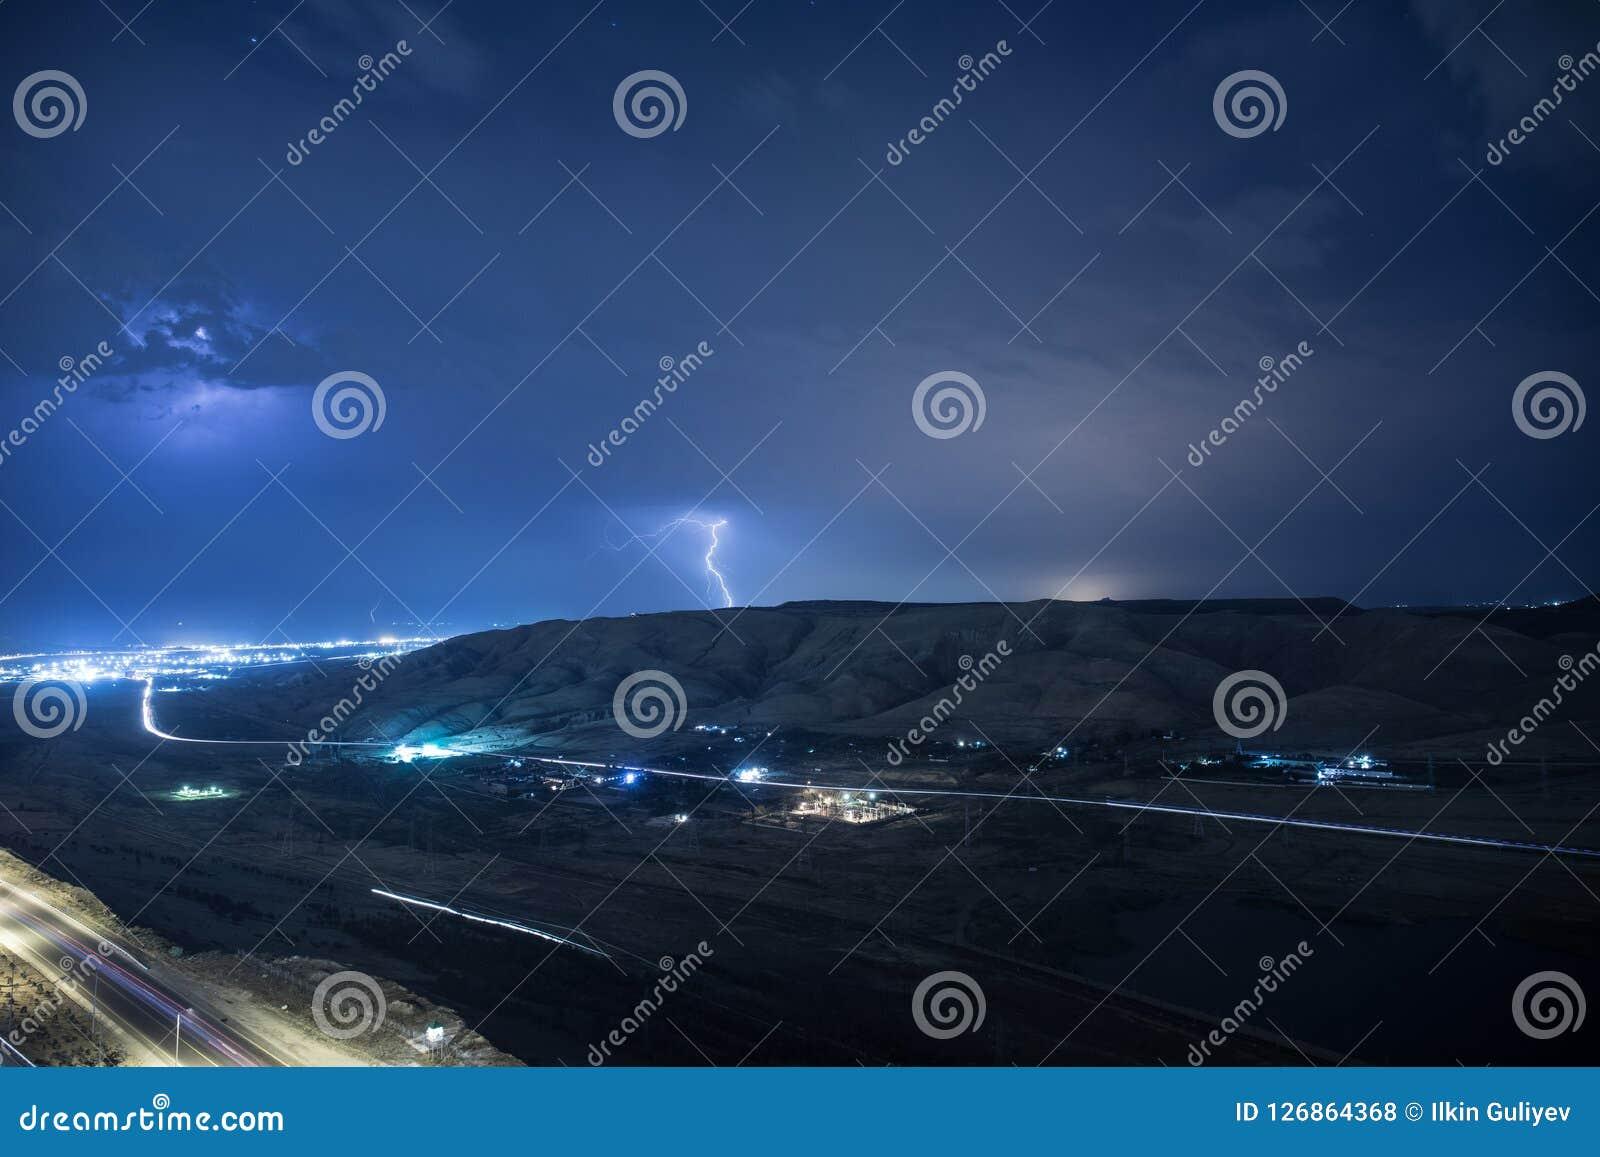 Summer storm bringing thunder, lightnings and rain. Baku. Azerbaijan Royalty Free Stock Photos